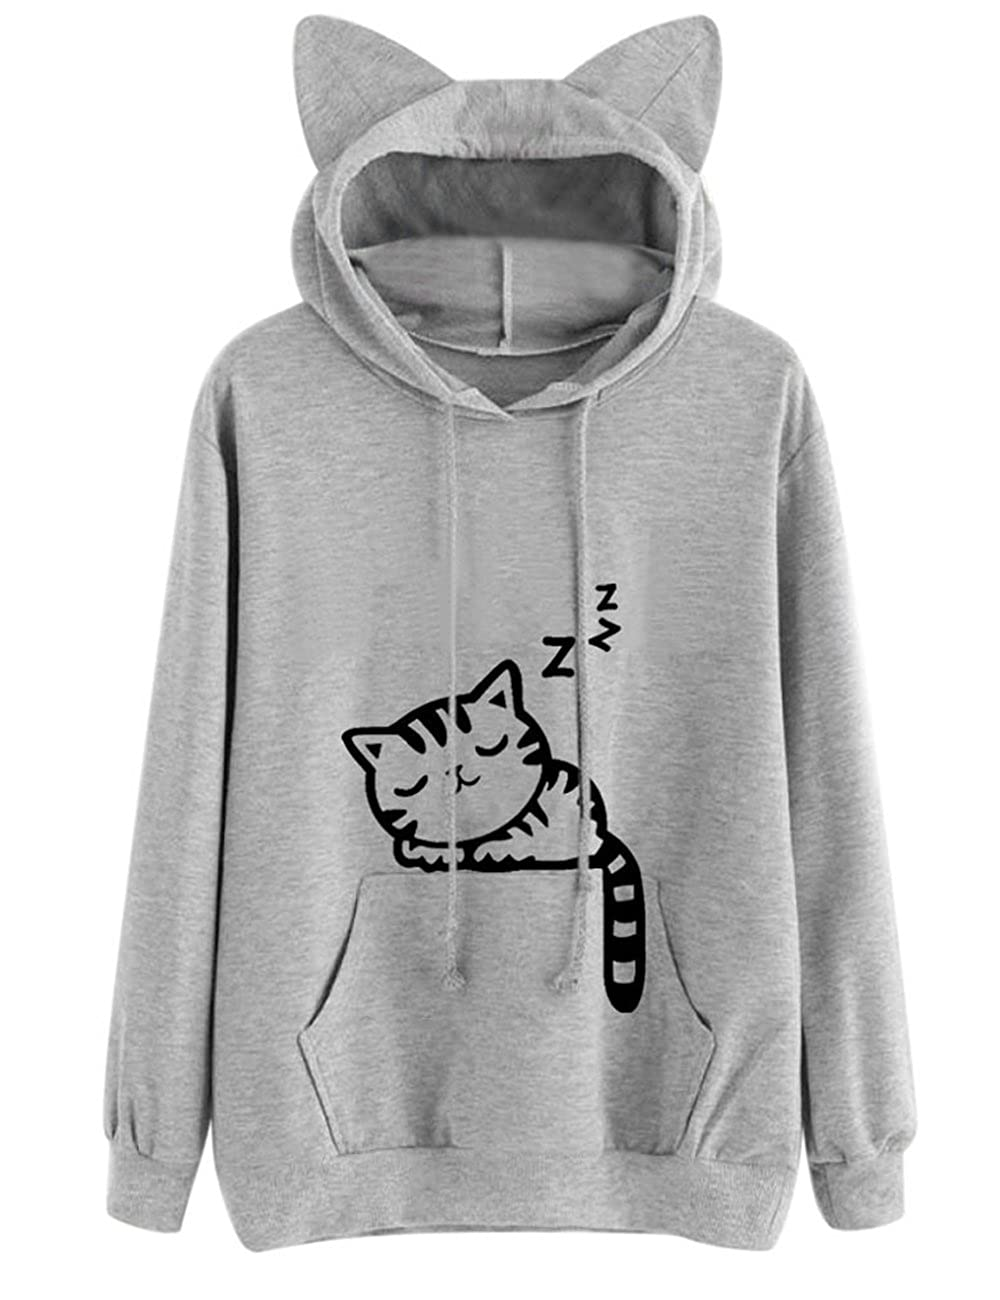 KEYEE Cute Cat Sweatshirt, Women Teen Girls Cotton Hoodie Sweater Pullover Tops with Pocket (M, Gray) DBK-12348076456t